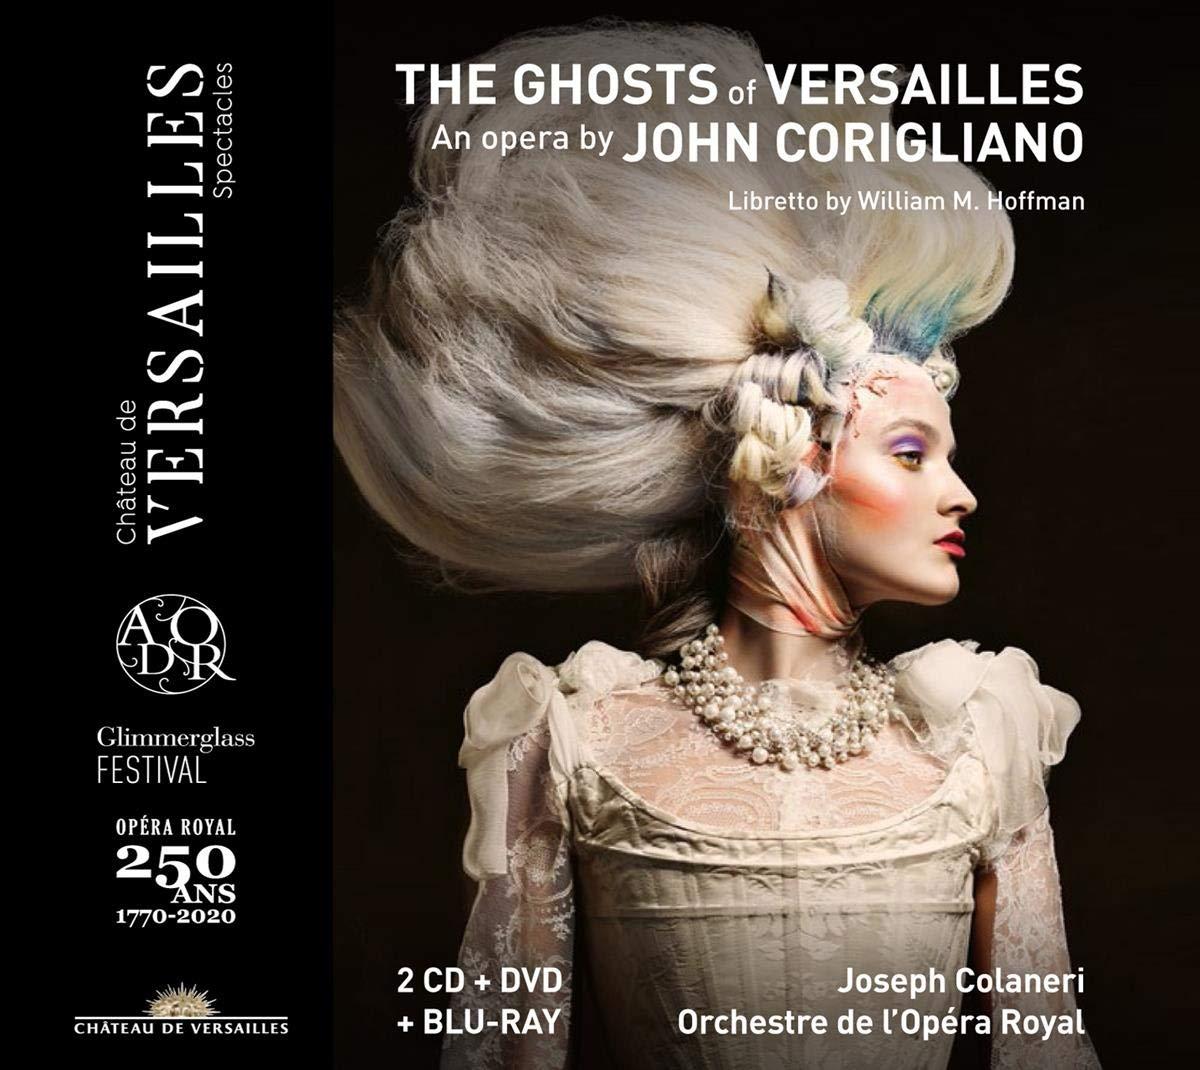 John Corigliano: The Ghosts Of Versailles - Joseph Colaneri